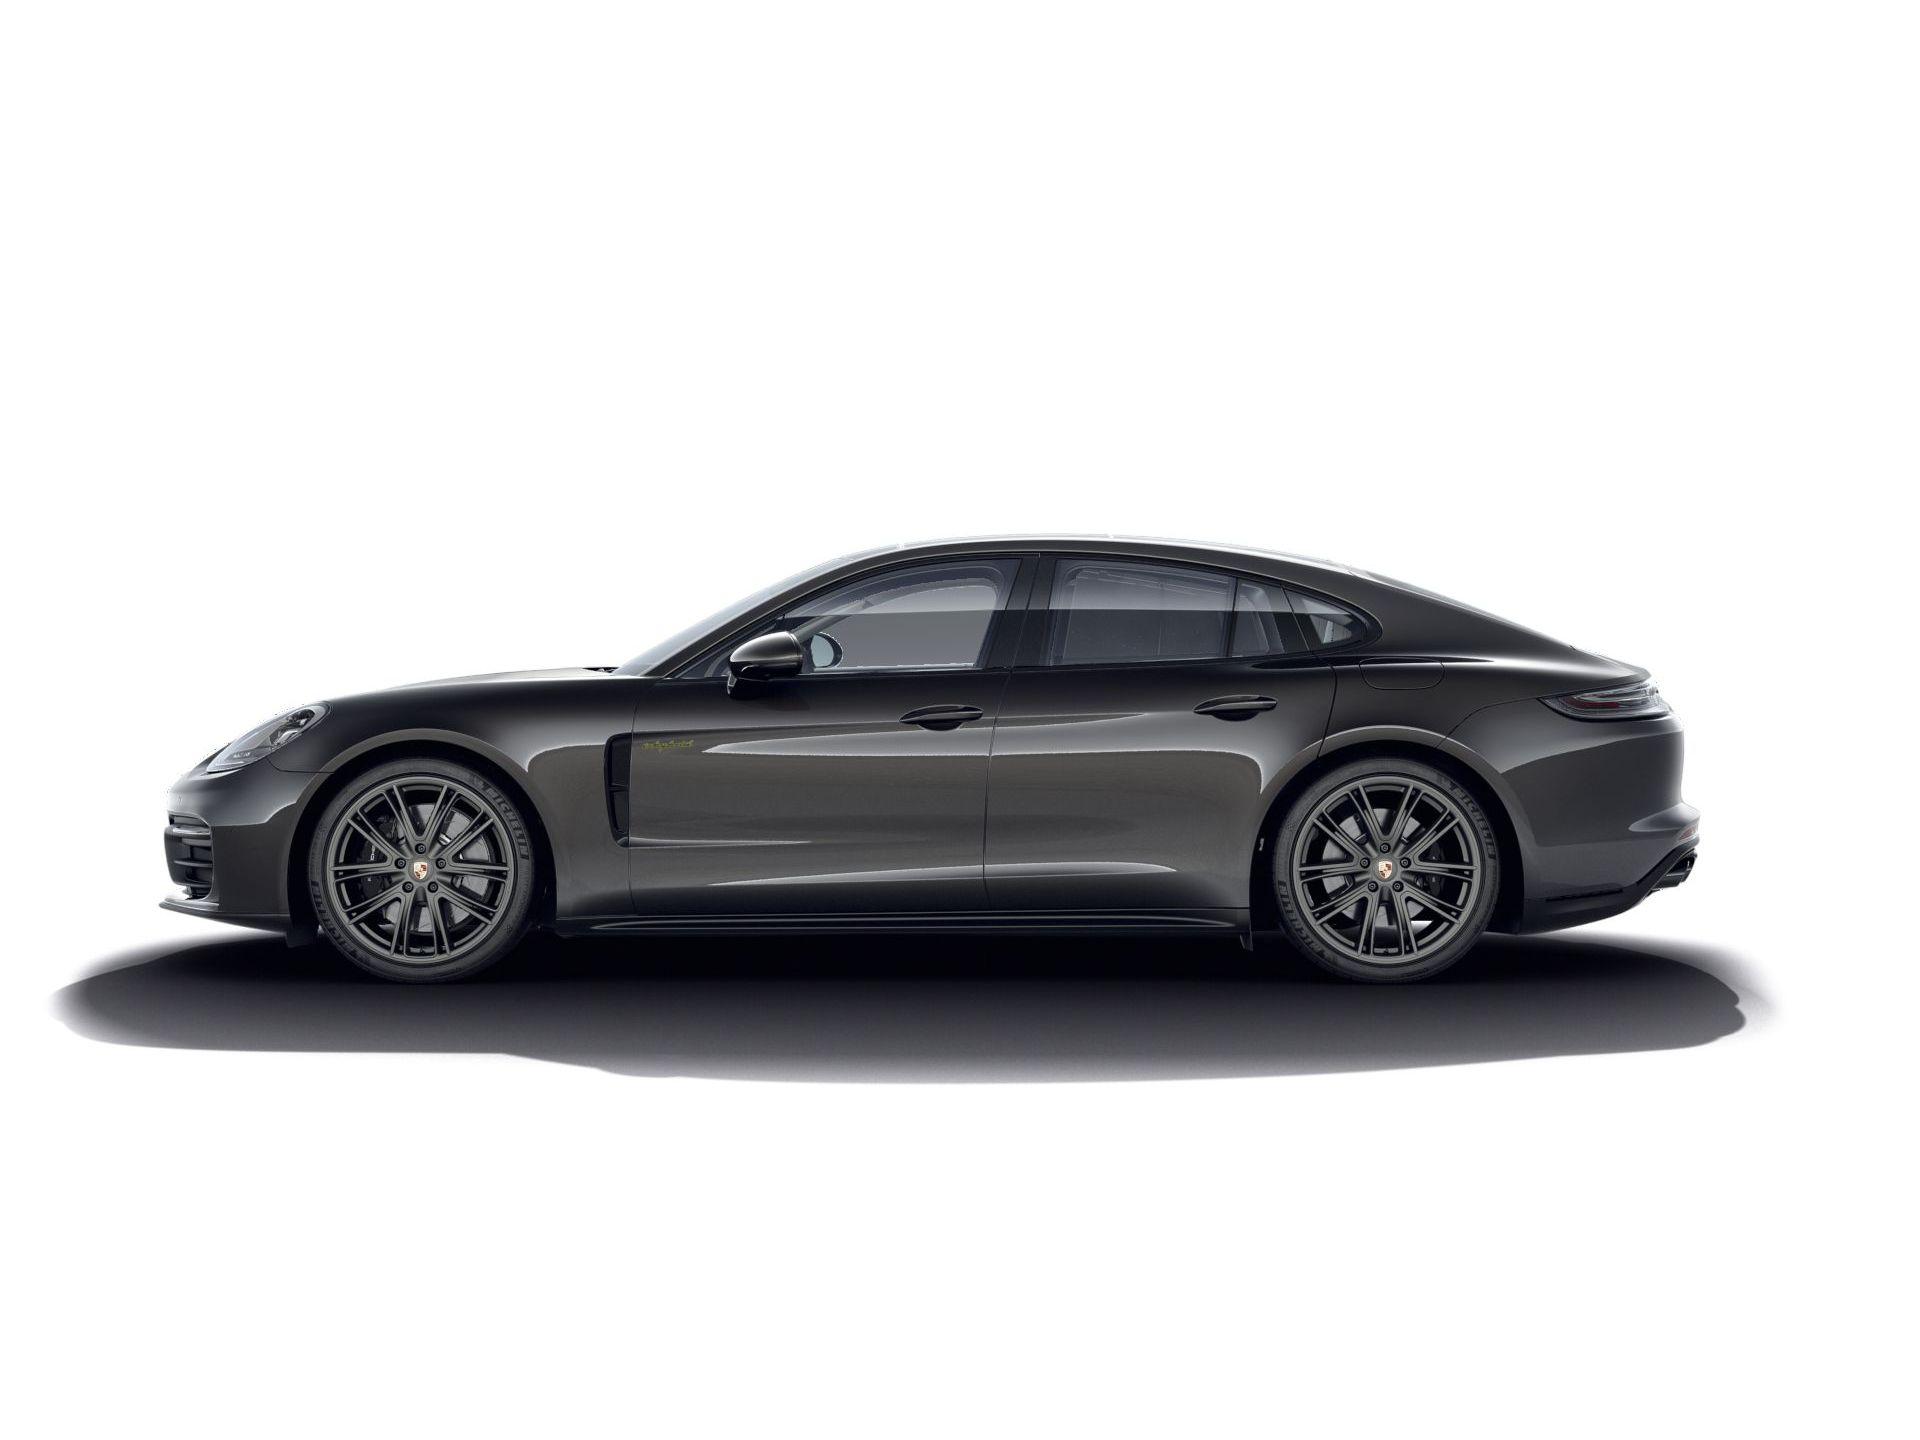 2022 Porsche Panamera 4 E-Hybrid – 2